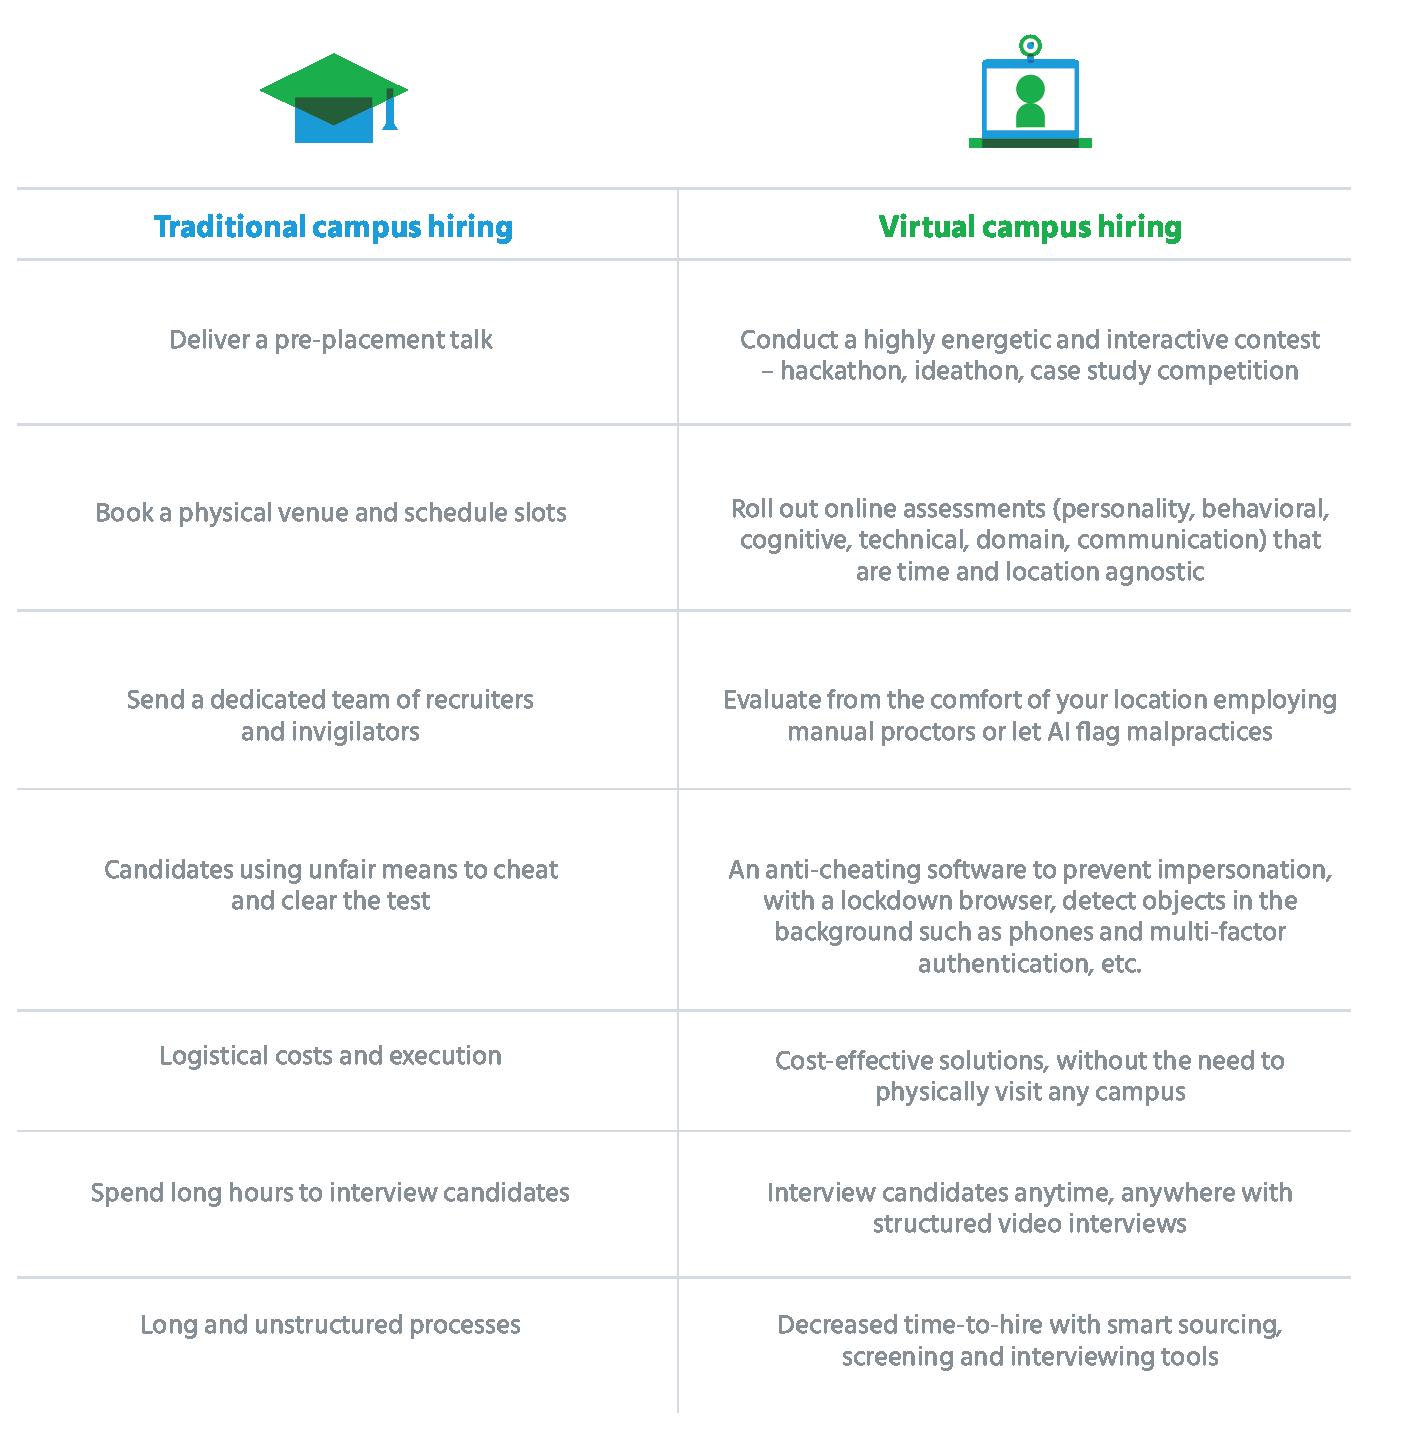 traditional_vs_virtual_campus_hiring